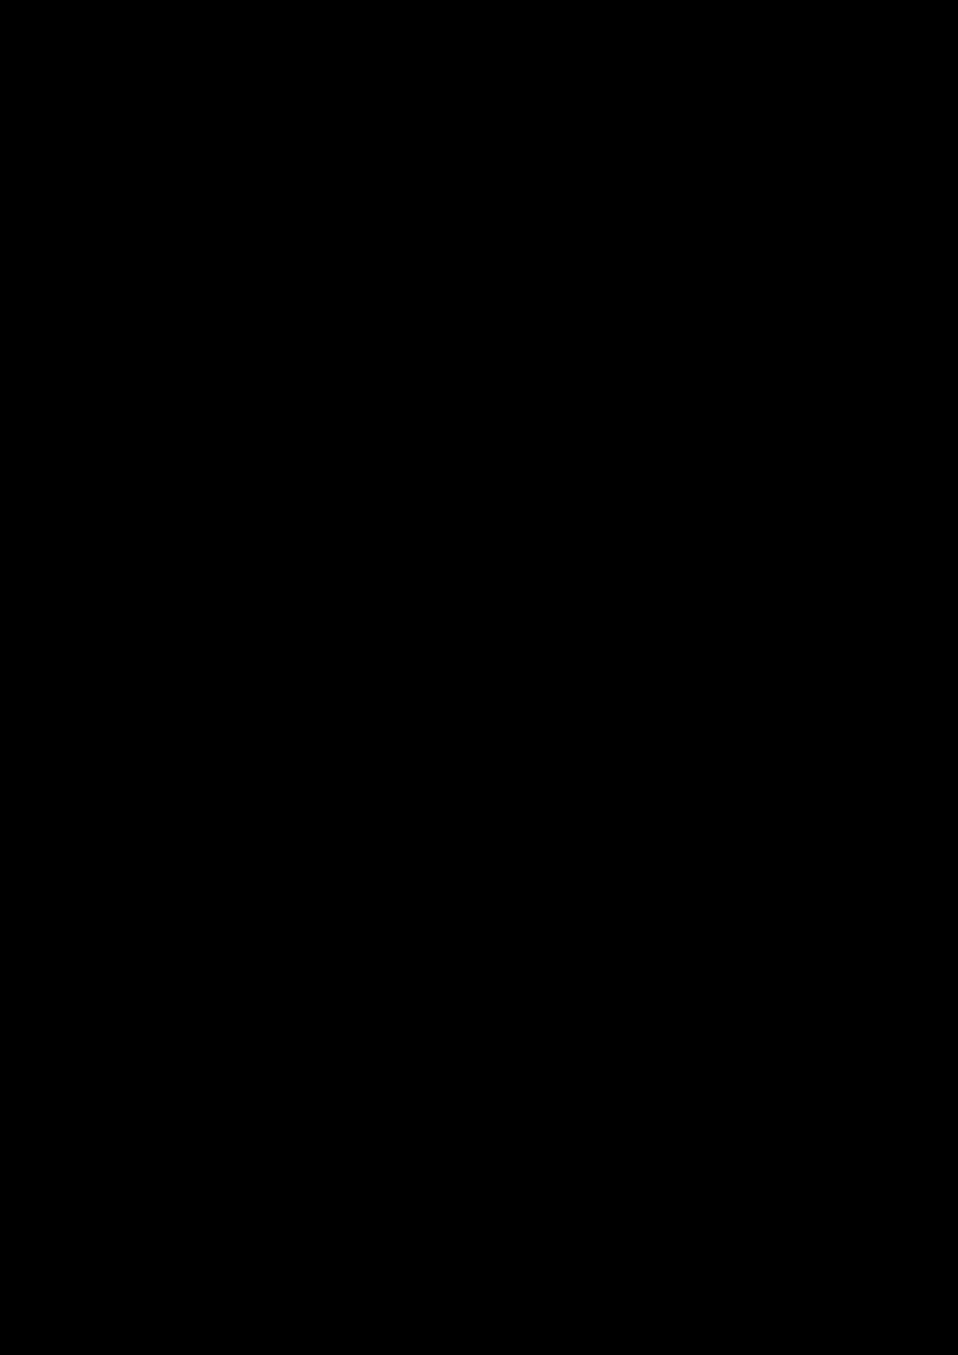 958x1355 Public Domain Clip Art Image Illustration Of A Female Silhouette